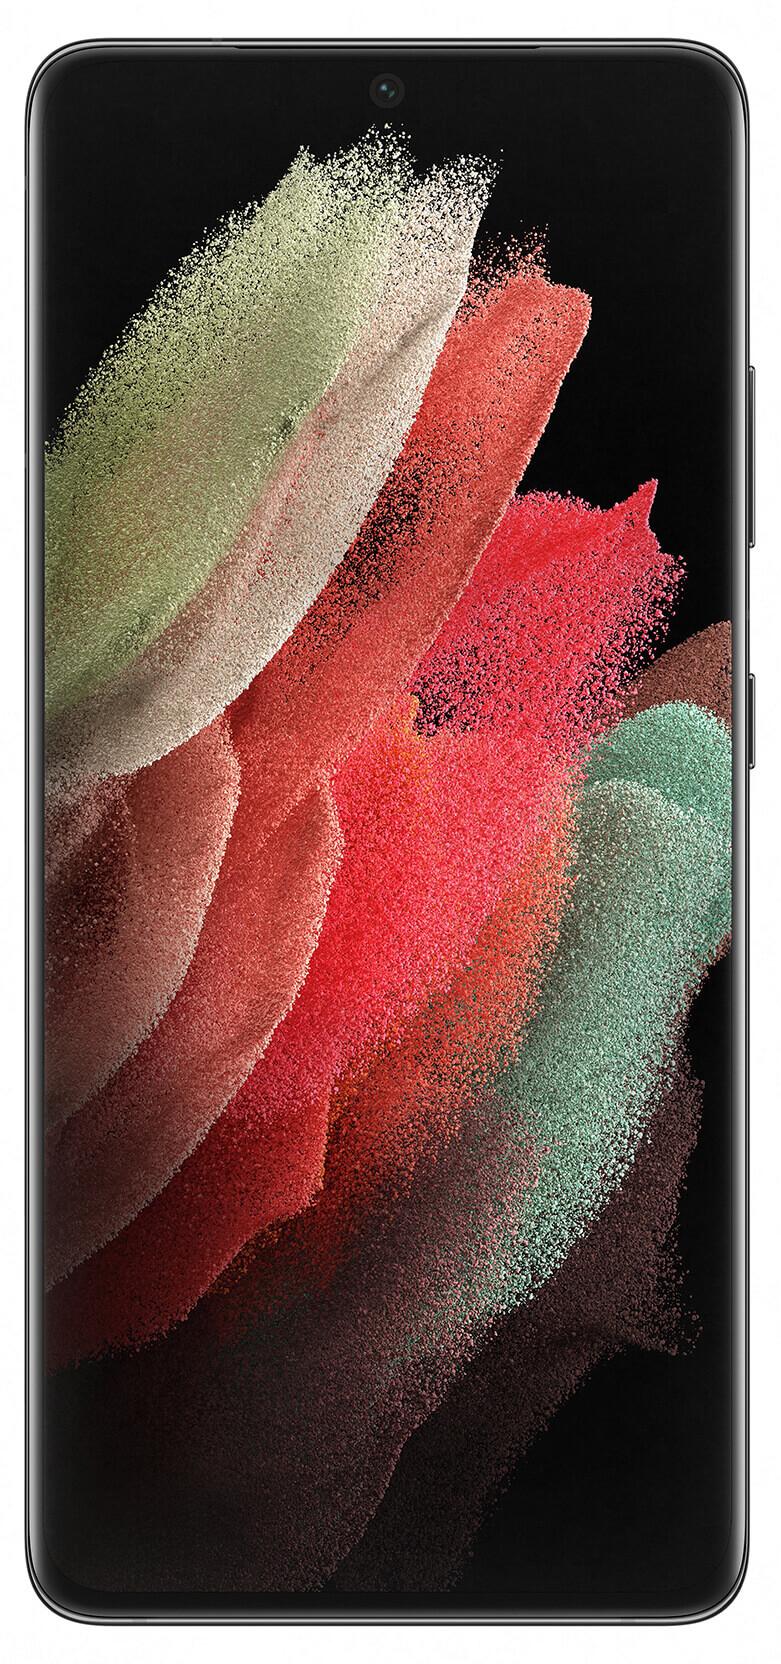 Samsung Galaxy S21 Ultra 5G Phantom Black 12GB RAM |256GB